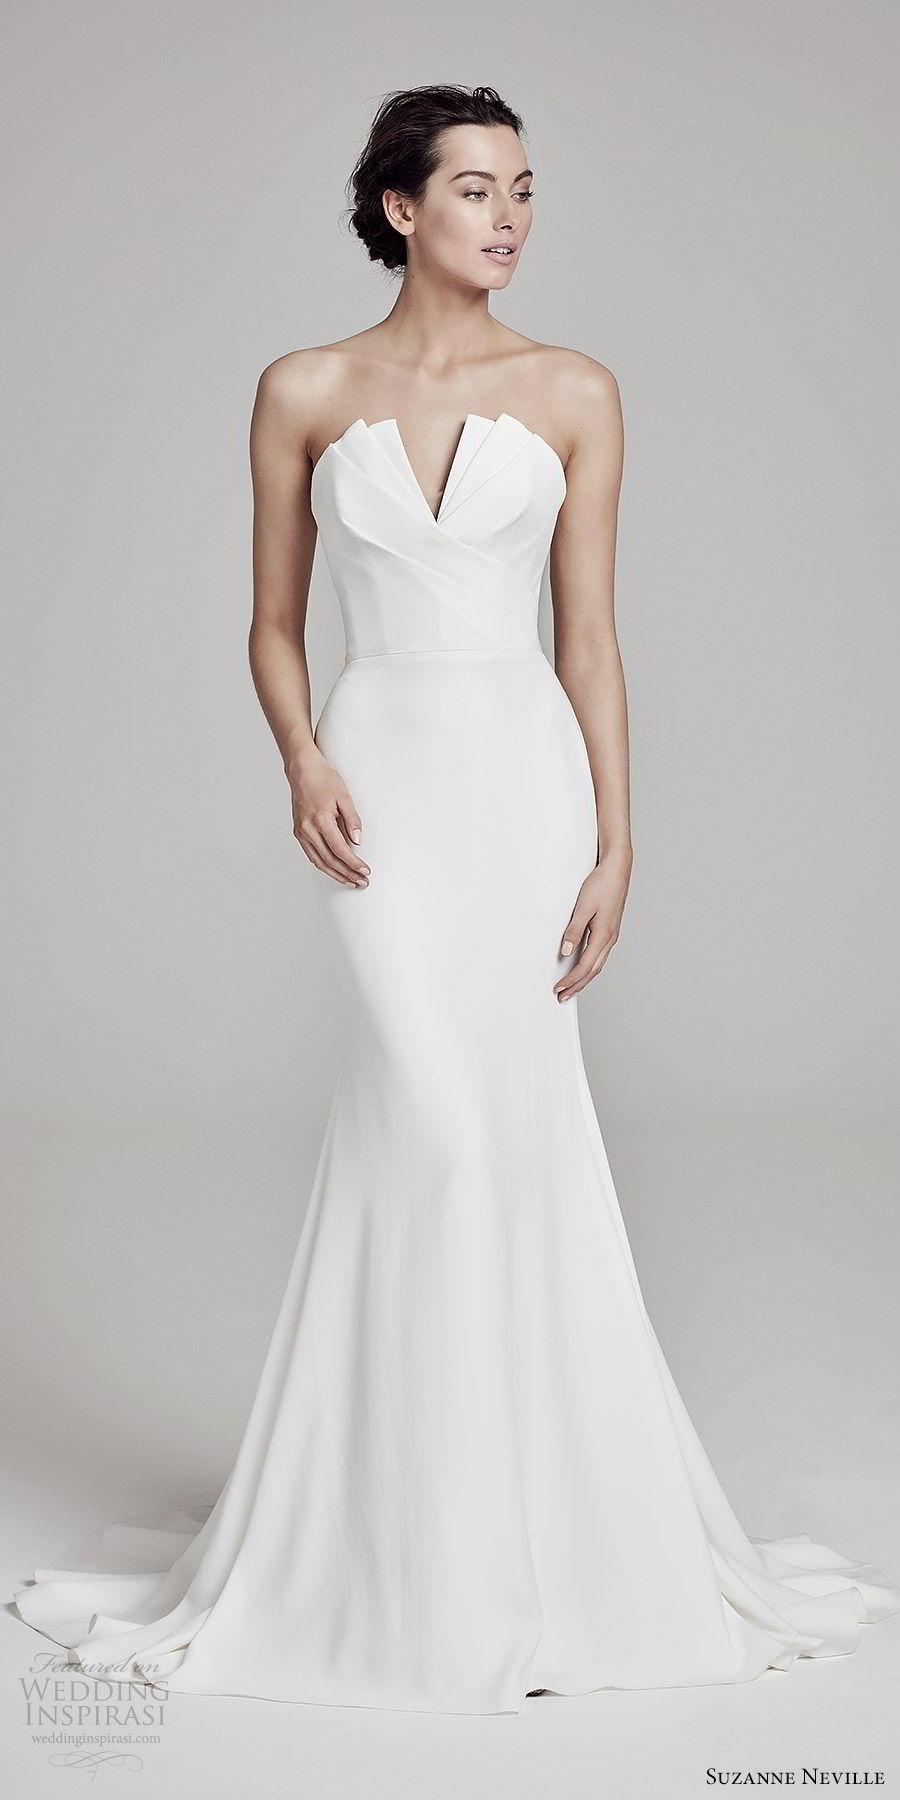 suzanne neville bridal 2019 strapless crumbcatcher split neckline minimal sheath wedding dress (carmella) sweep train chic elegant mv